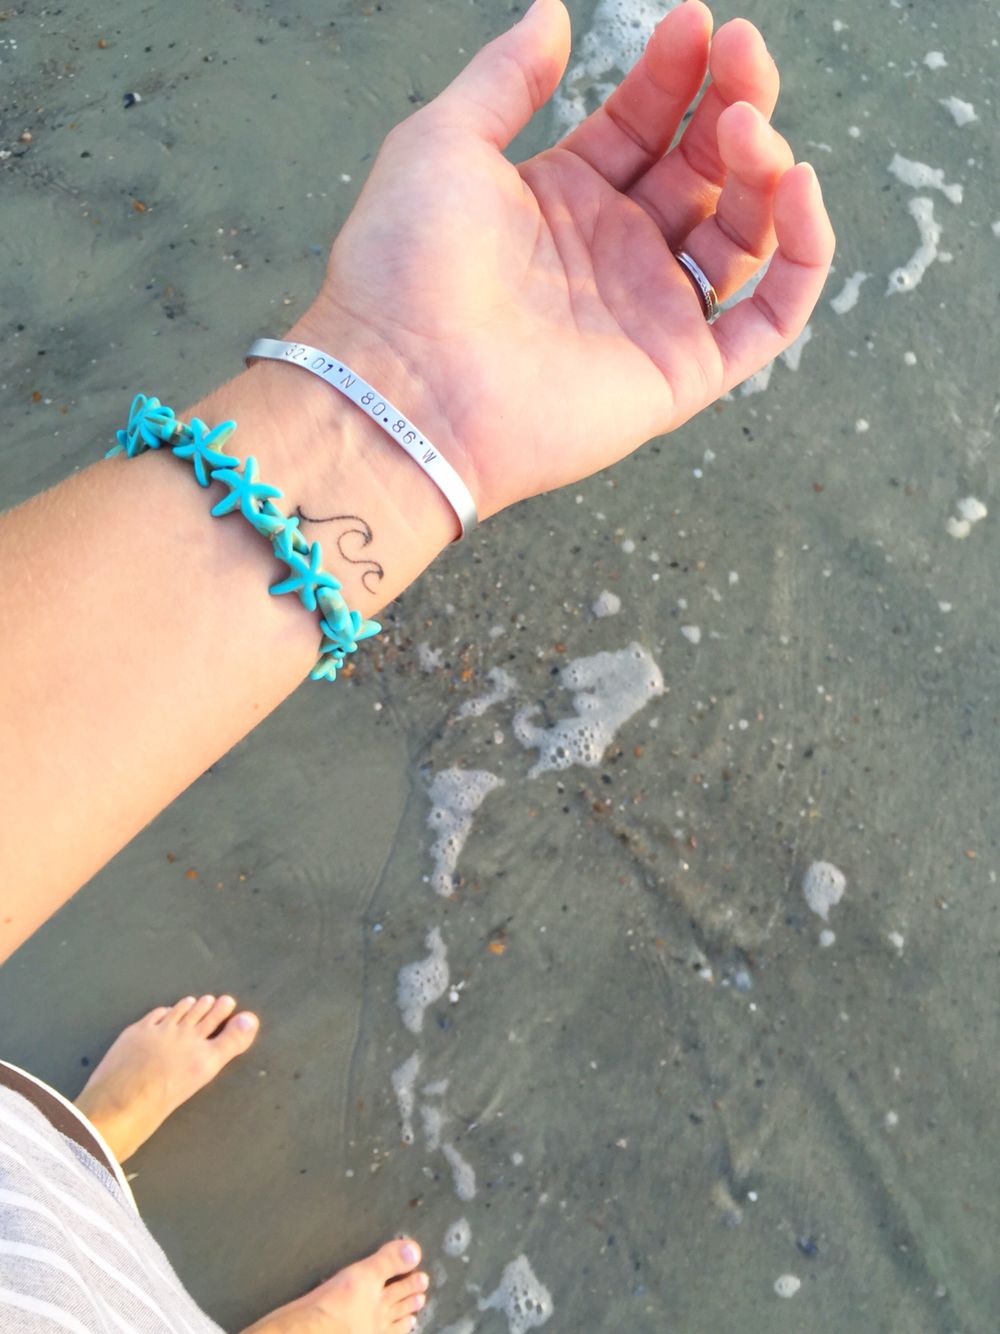 Wave wrist tattoo (With images) Wave tattoo wrist, Wrist